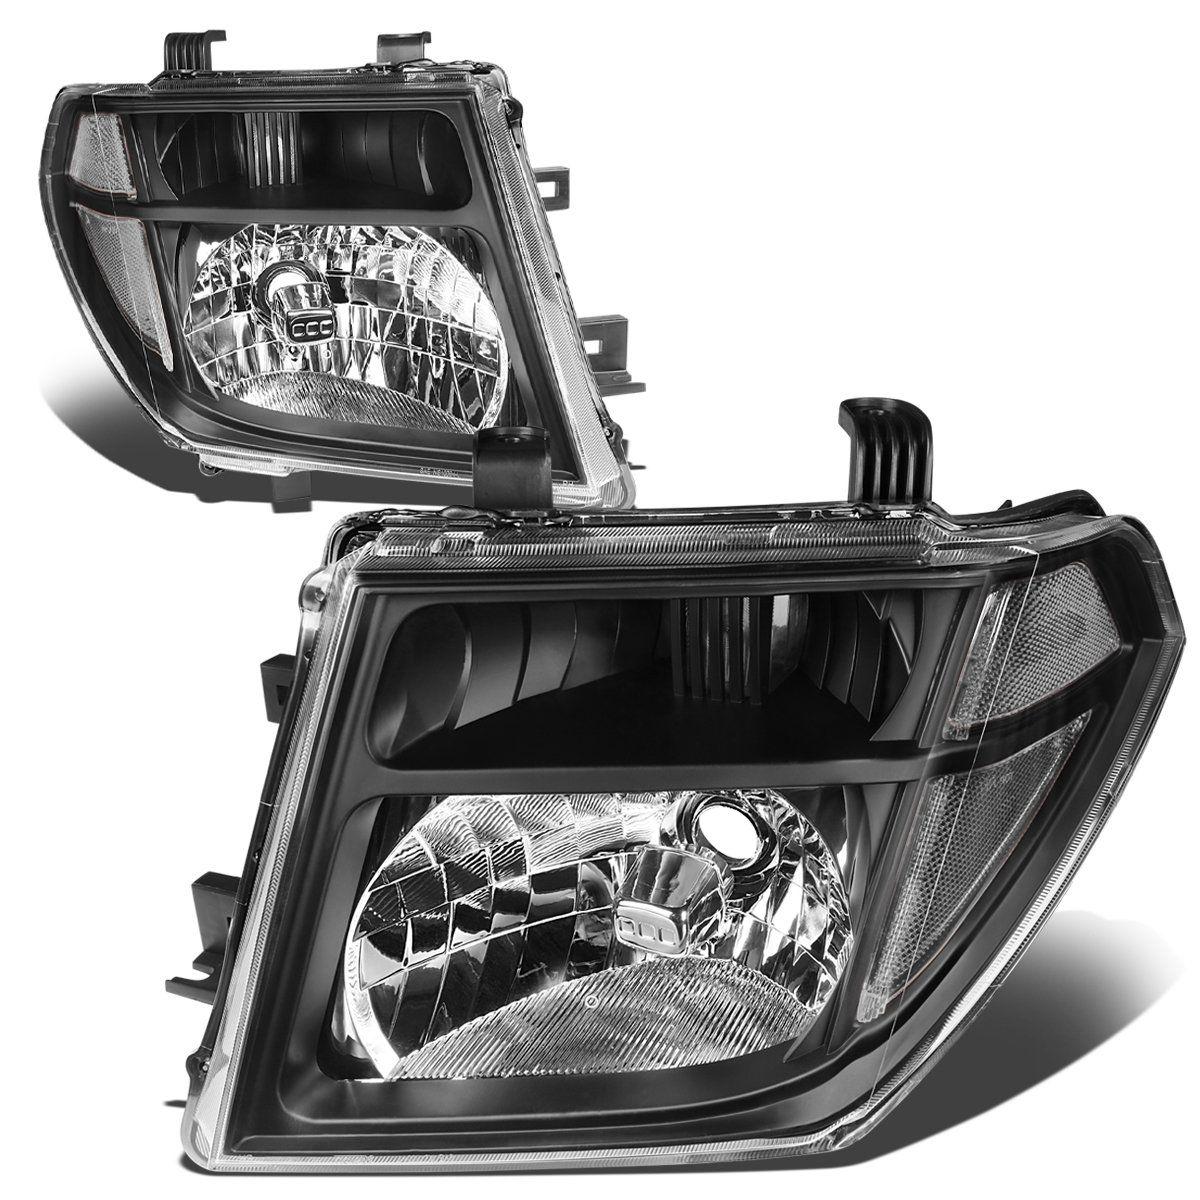 05 08 Nissan Frontier Pathfinder Headlights Black Housing Clear Corner In 2021 Nissan Frontier Nissan Black Headlights